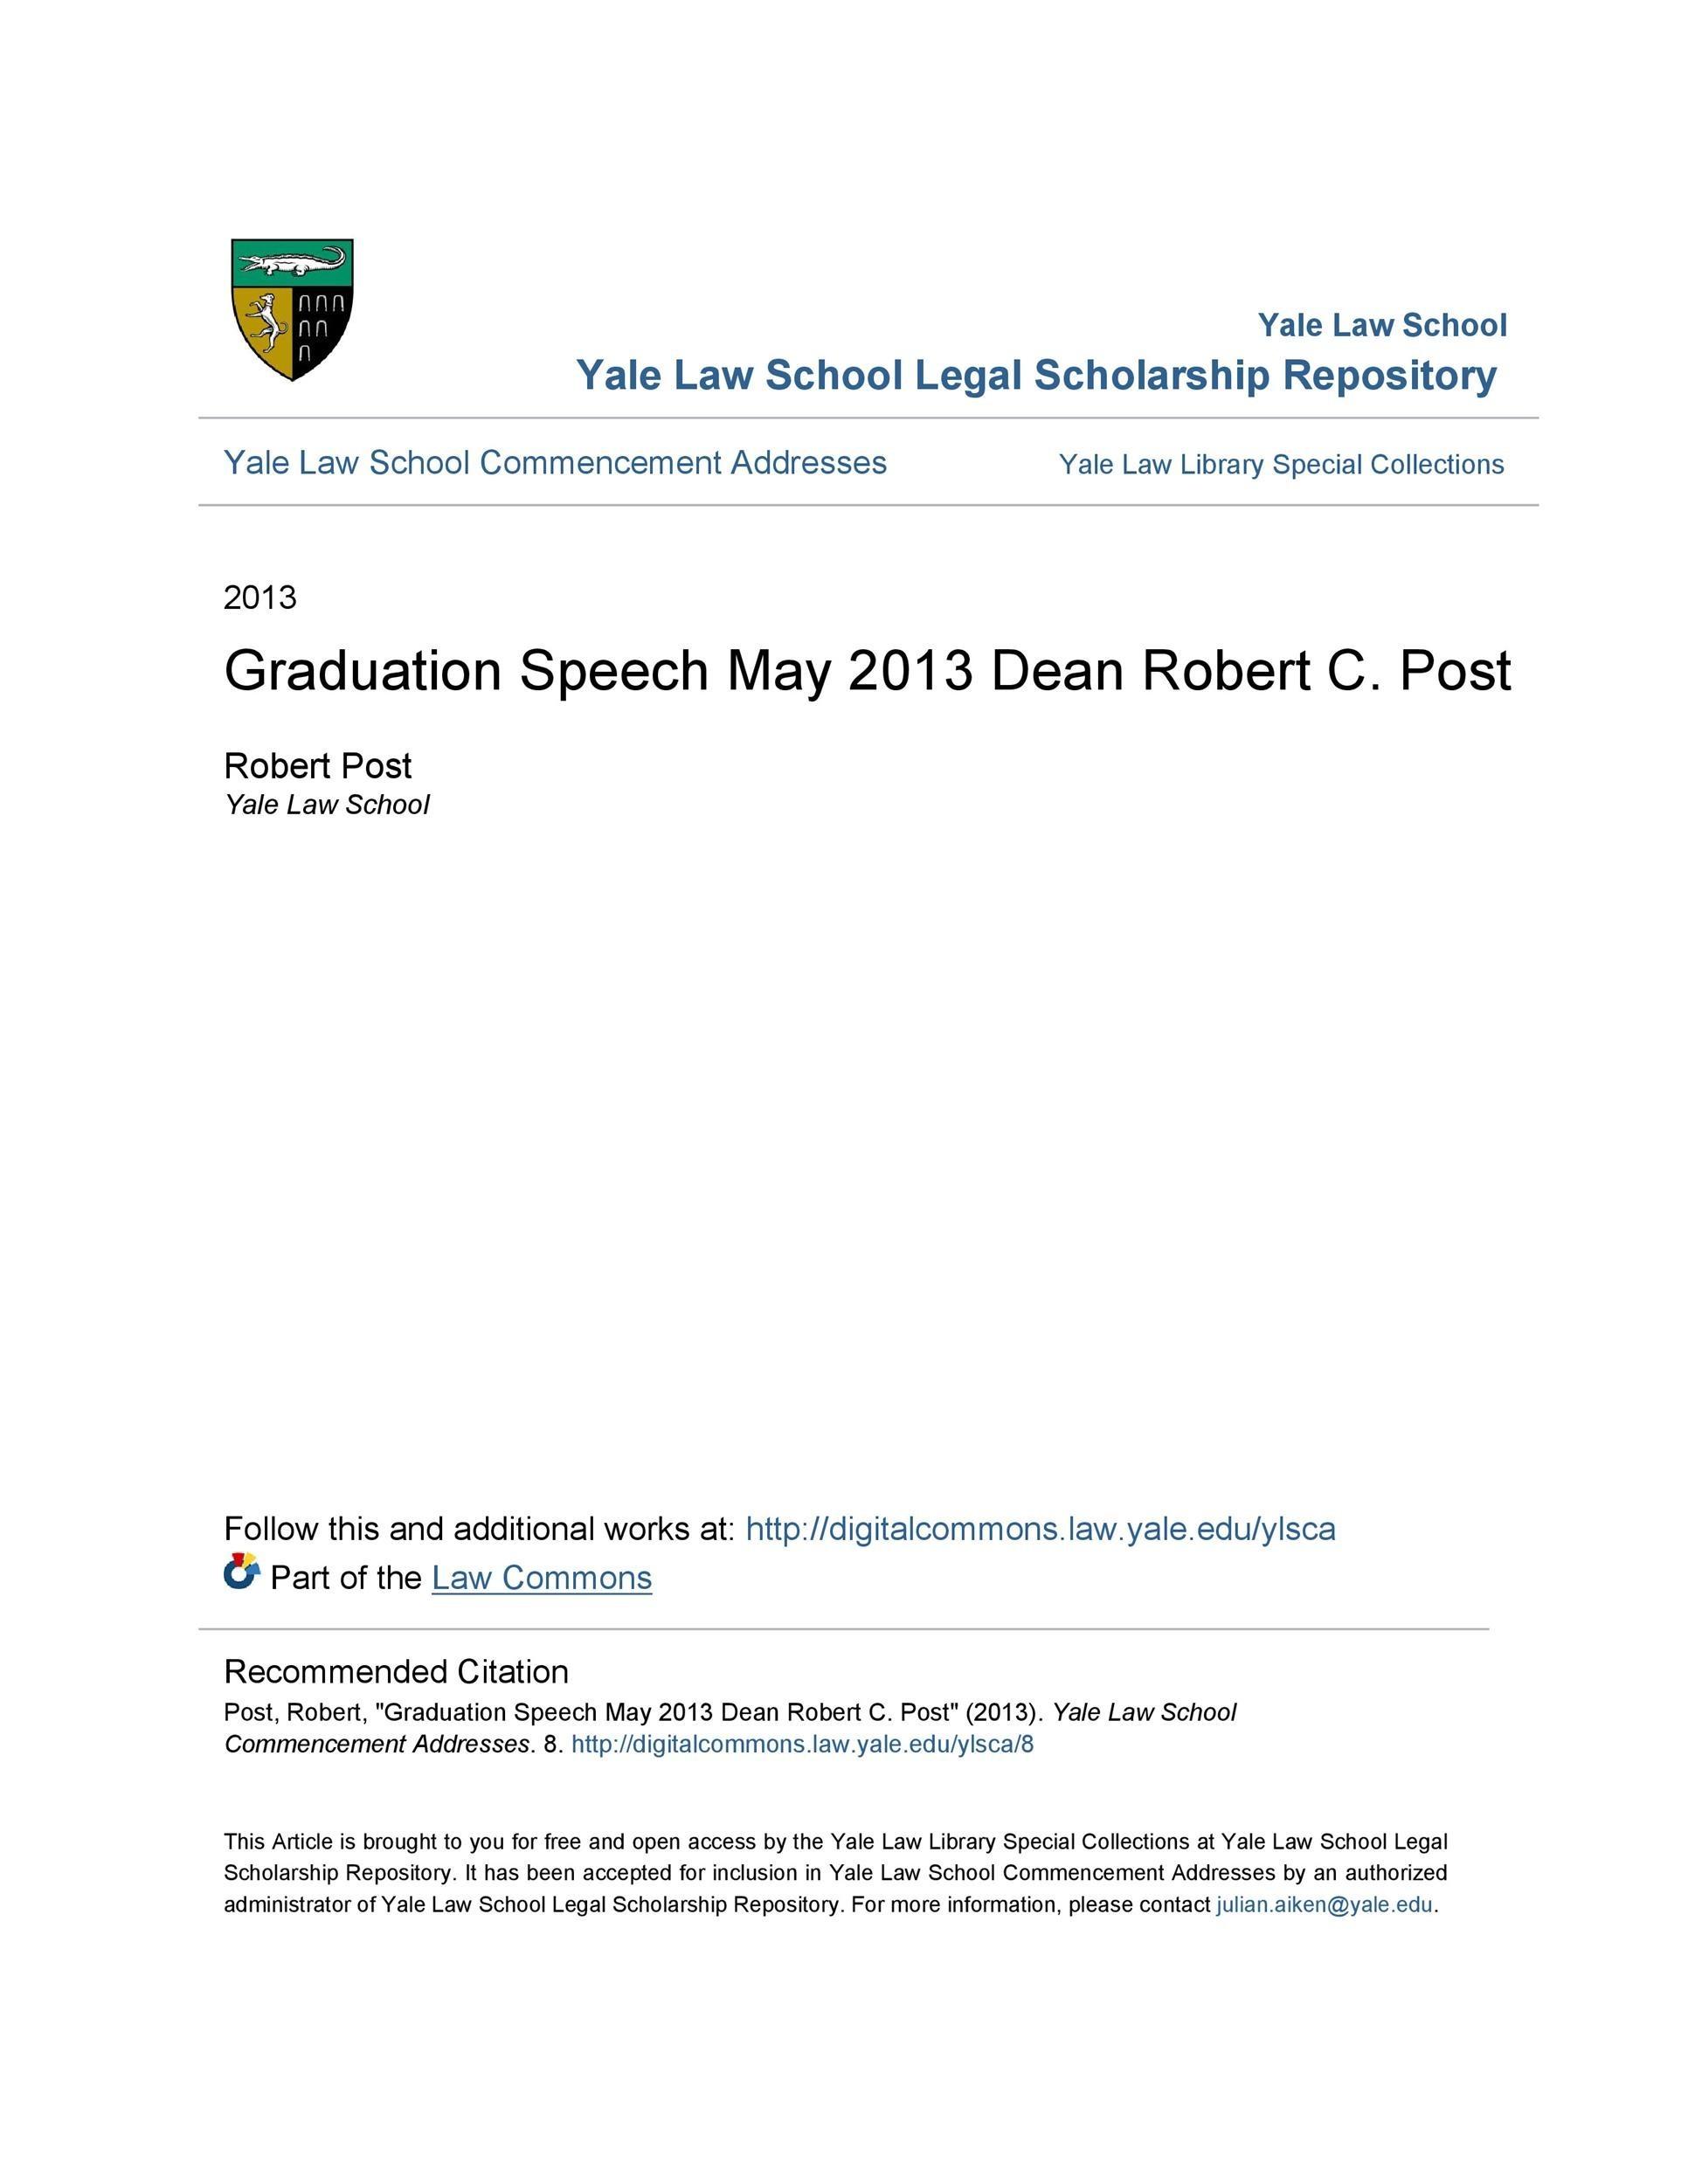 Free graduation speech example 13